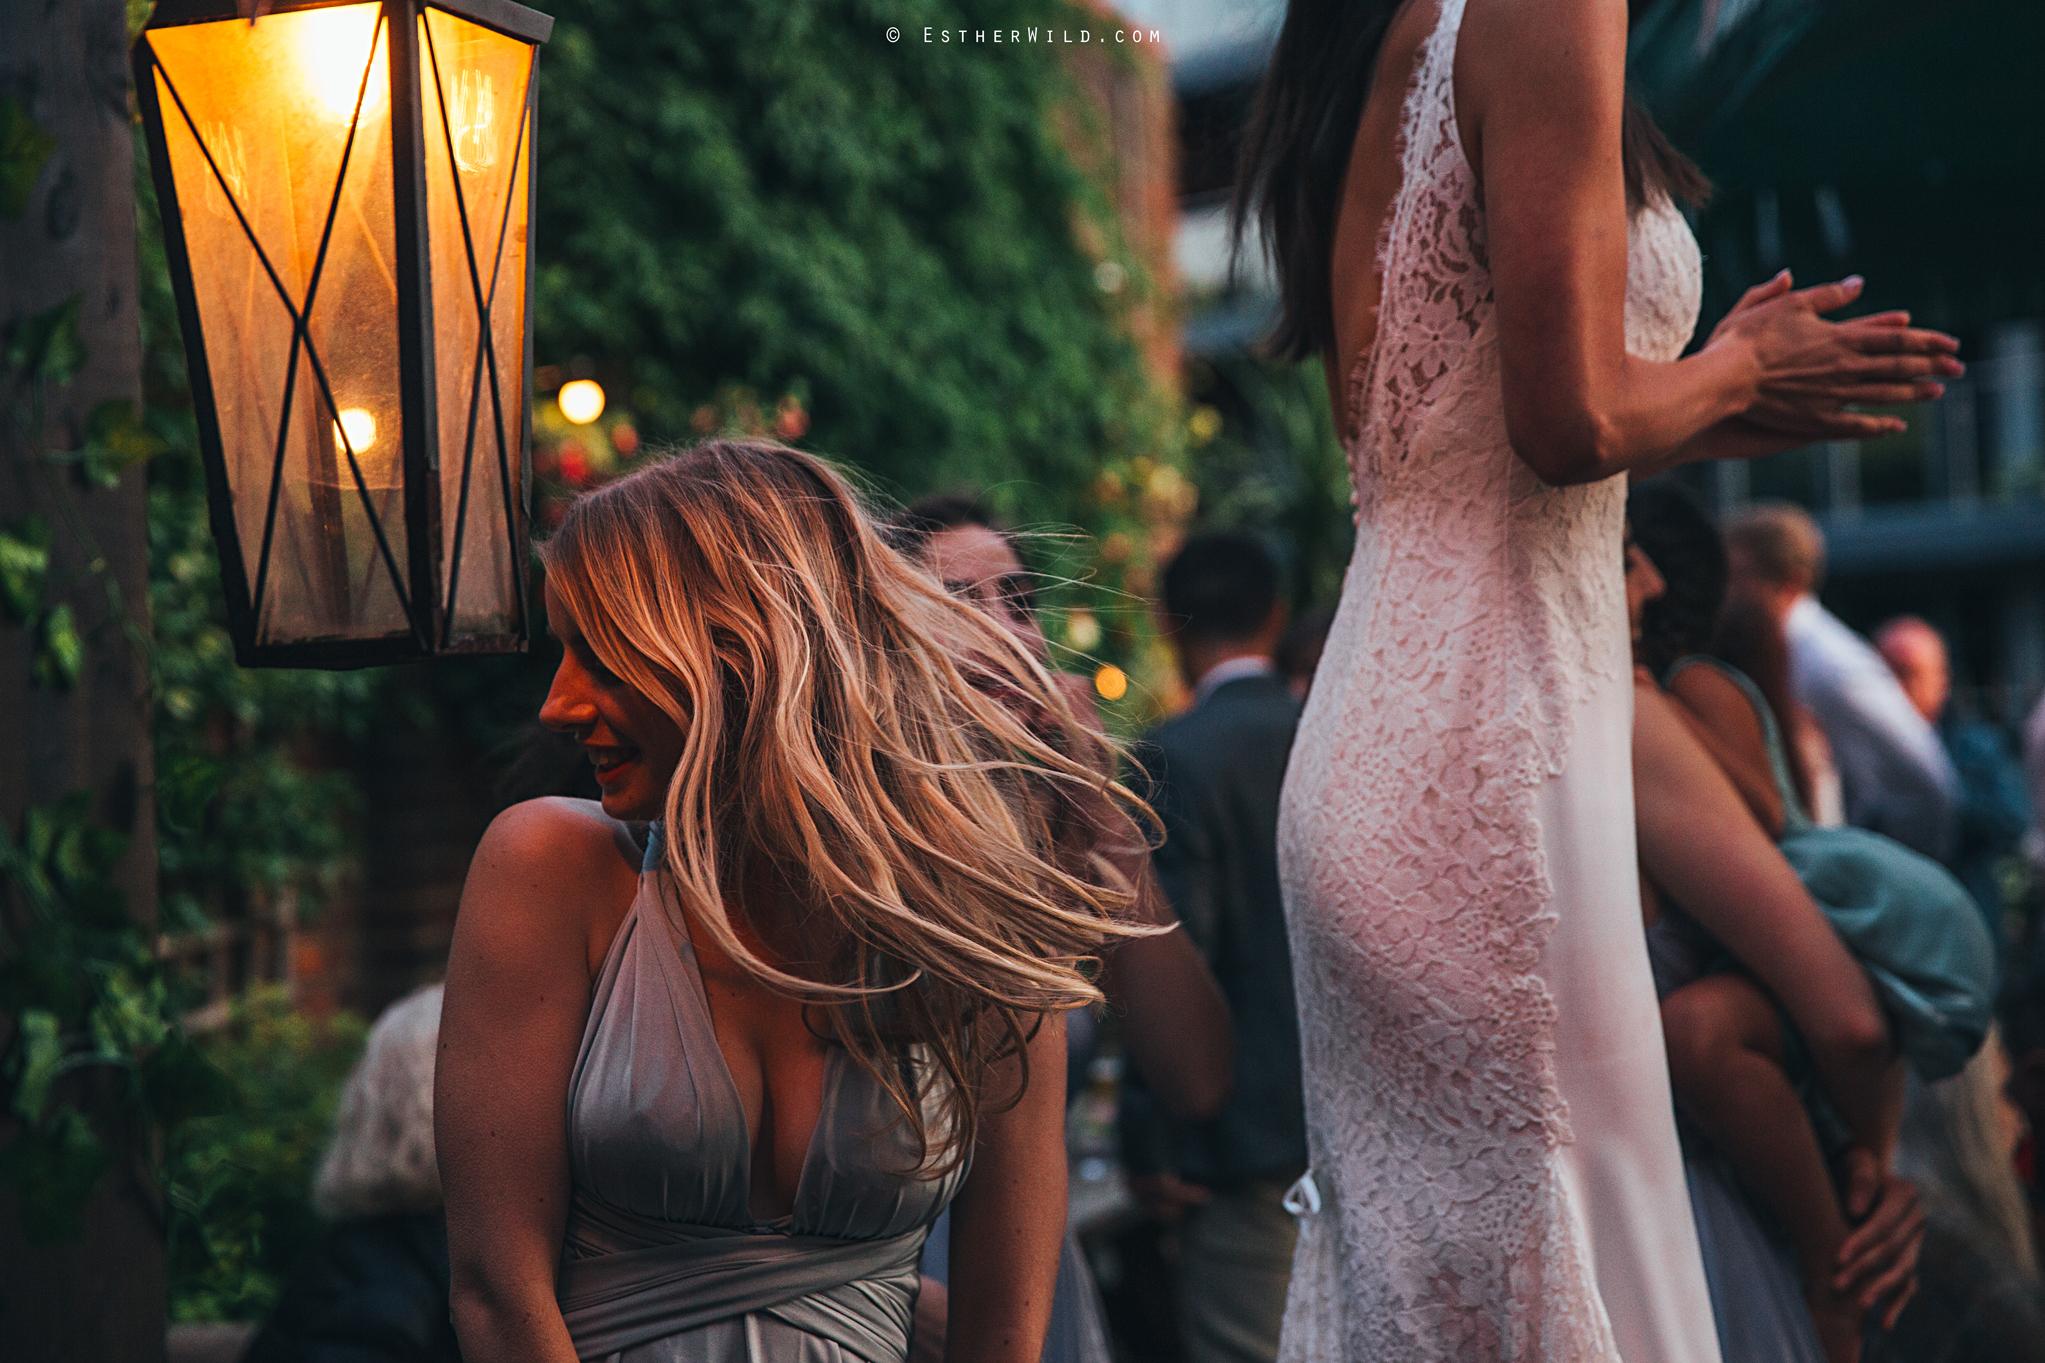 Islington_Town_Hall_Wedding_London_Photographer_Esther_Wild_IMG_7757.jpg